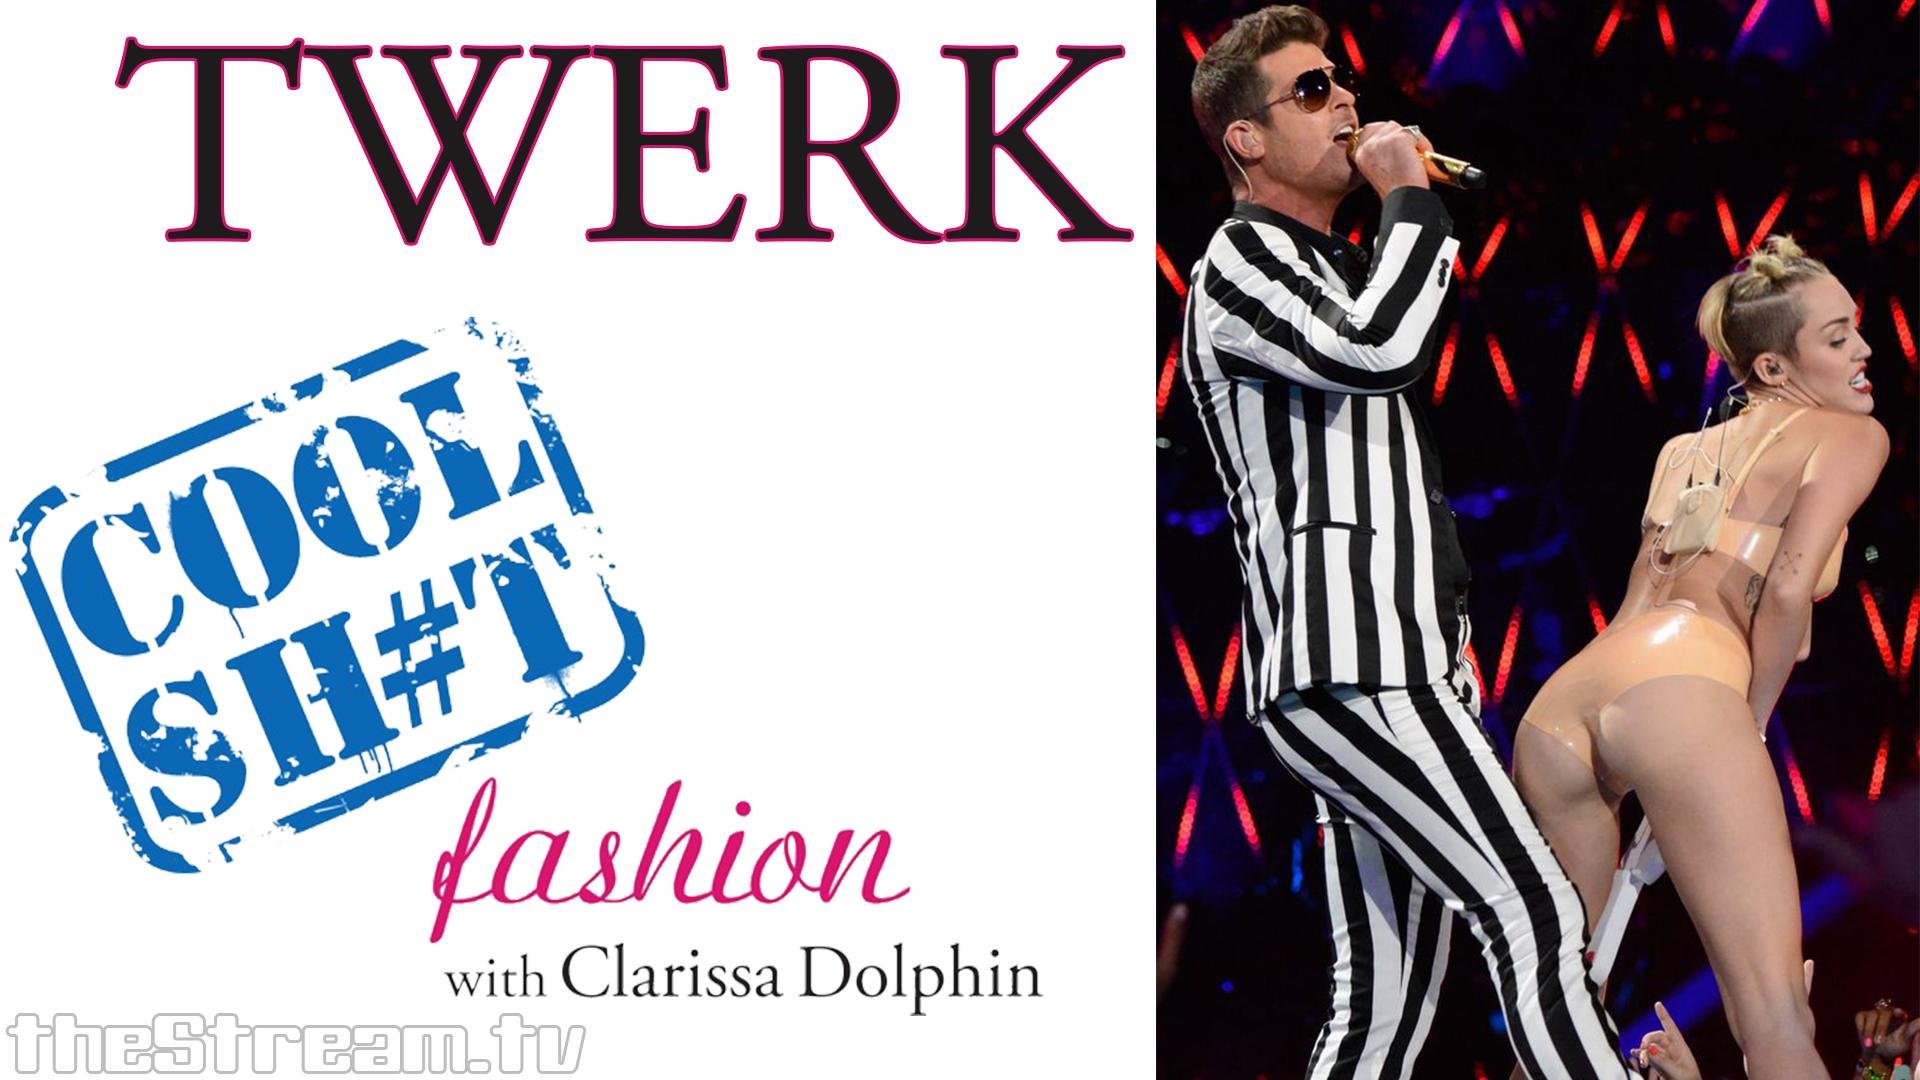 Cool Sh#t: Fashion with Clarissa Dolphin – Twerk